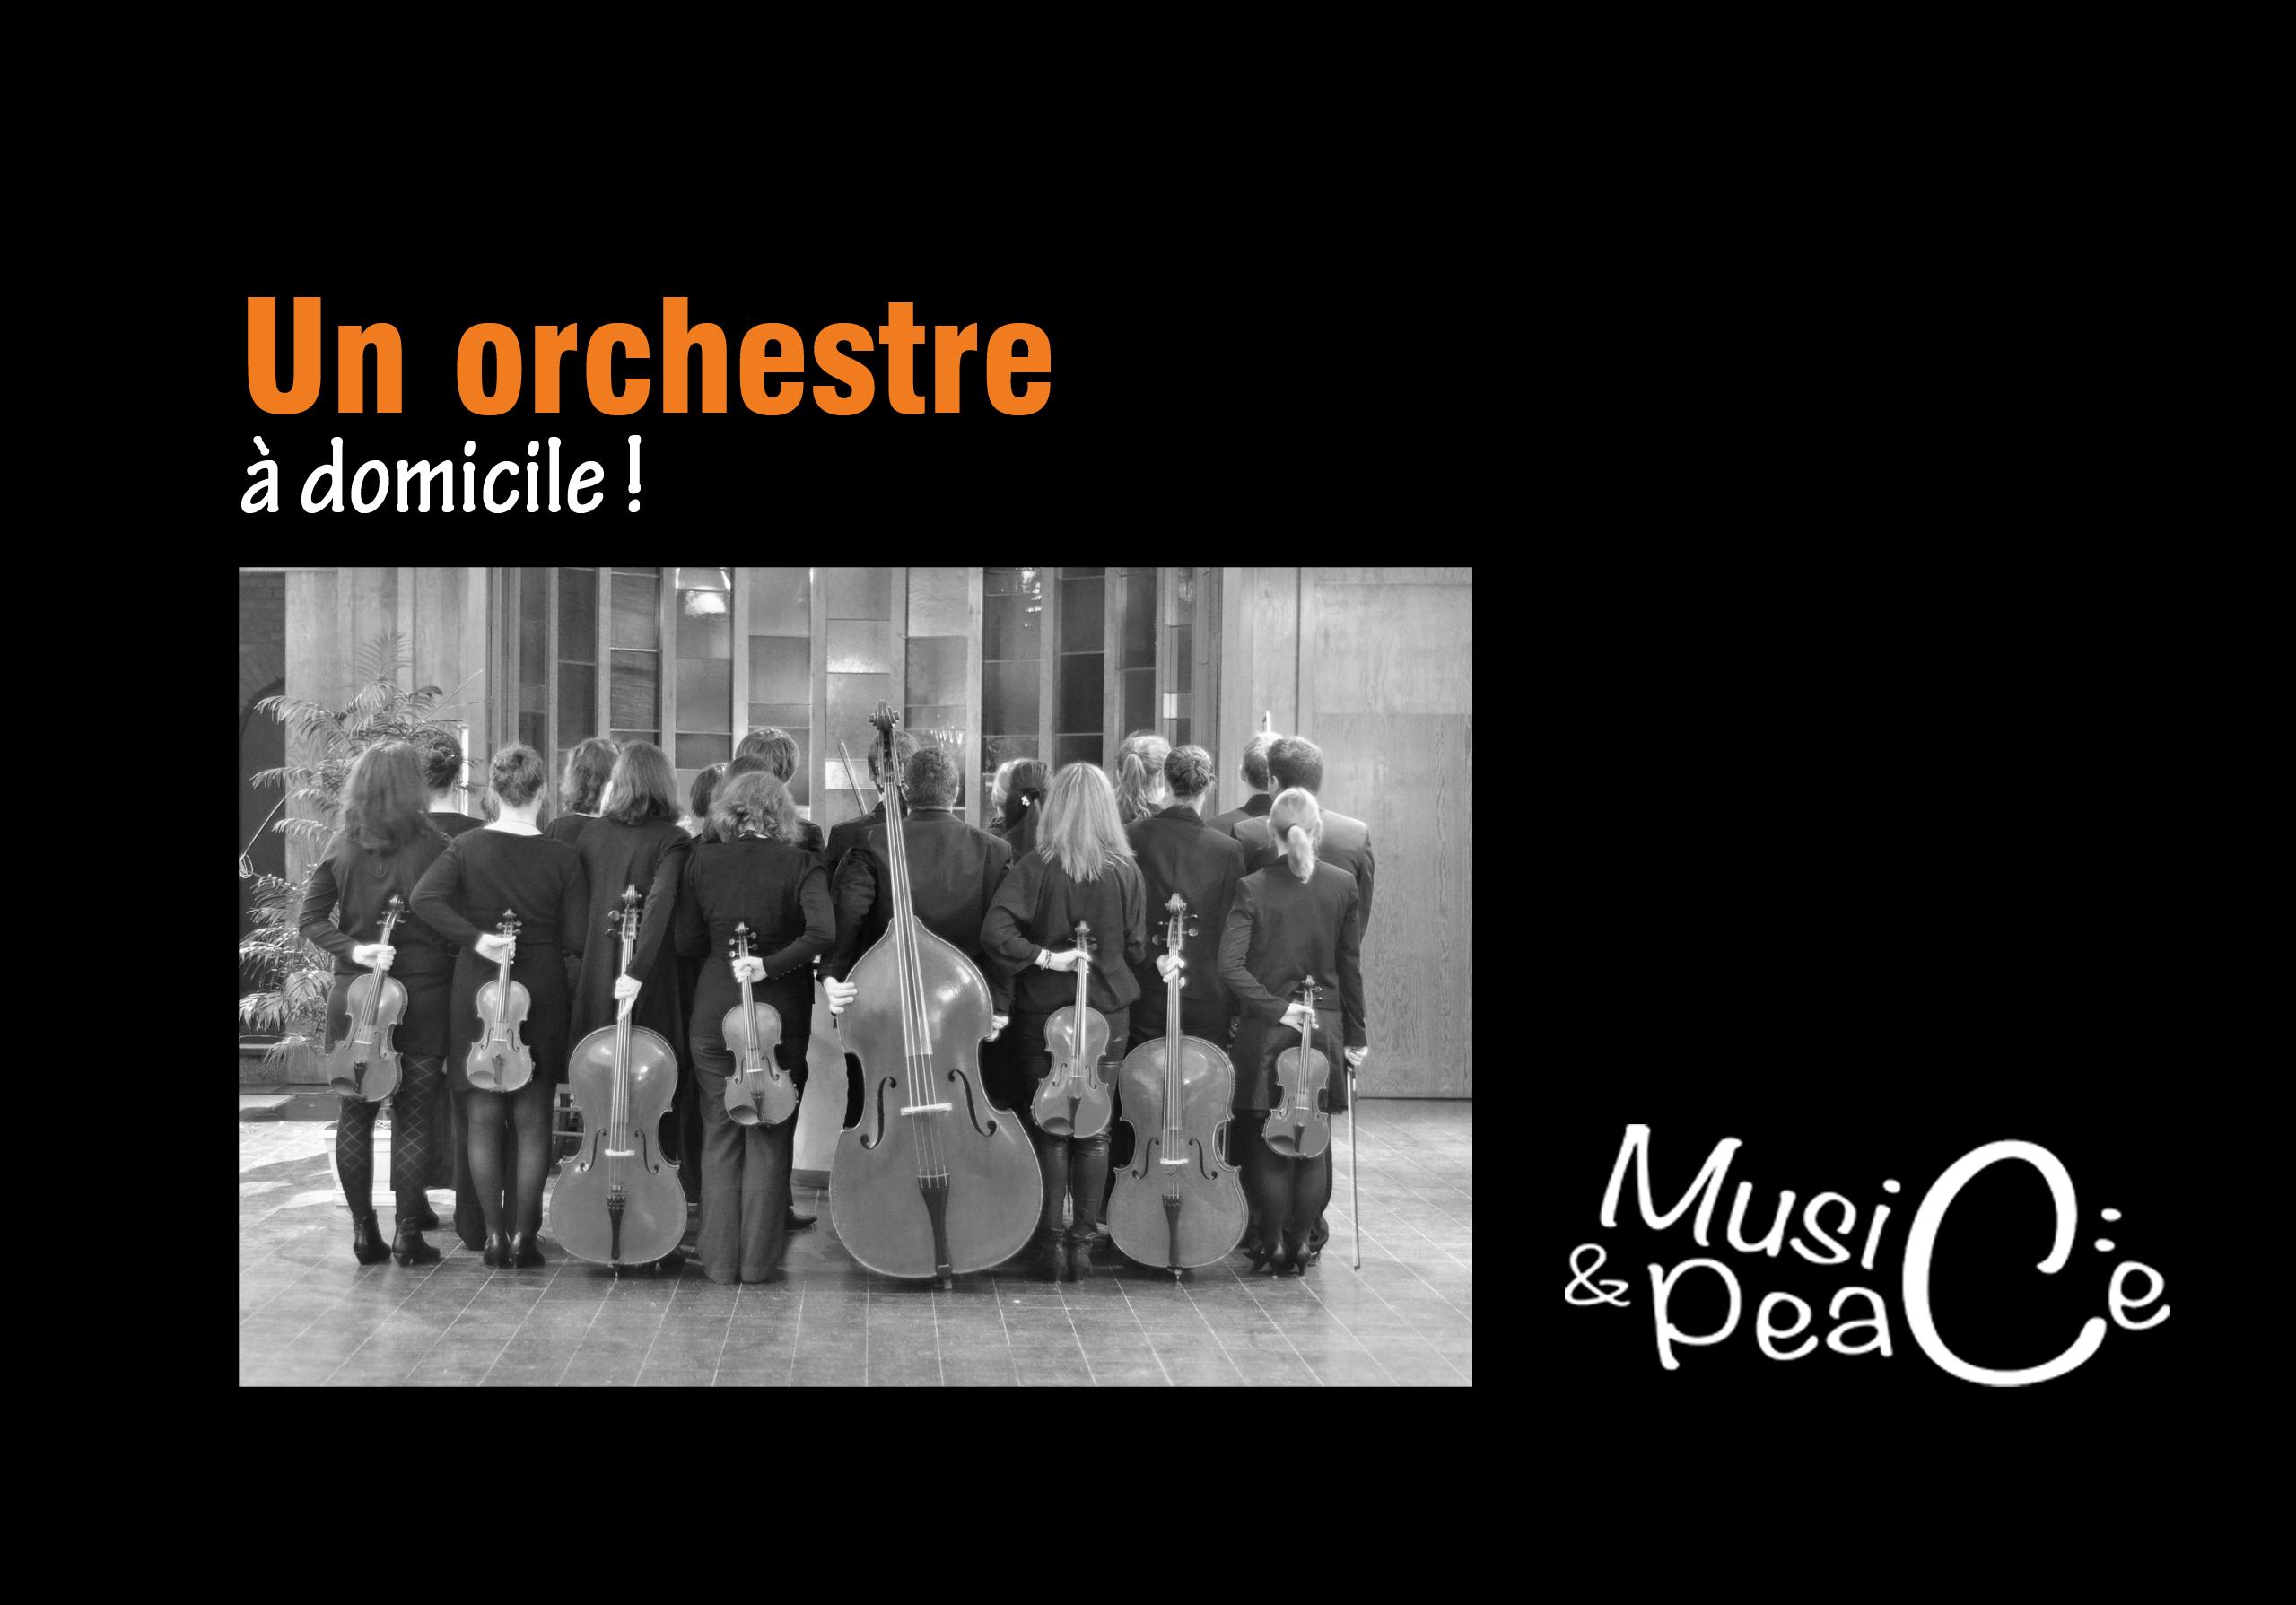 orchestre-1422455838.jpg